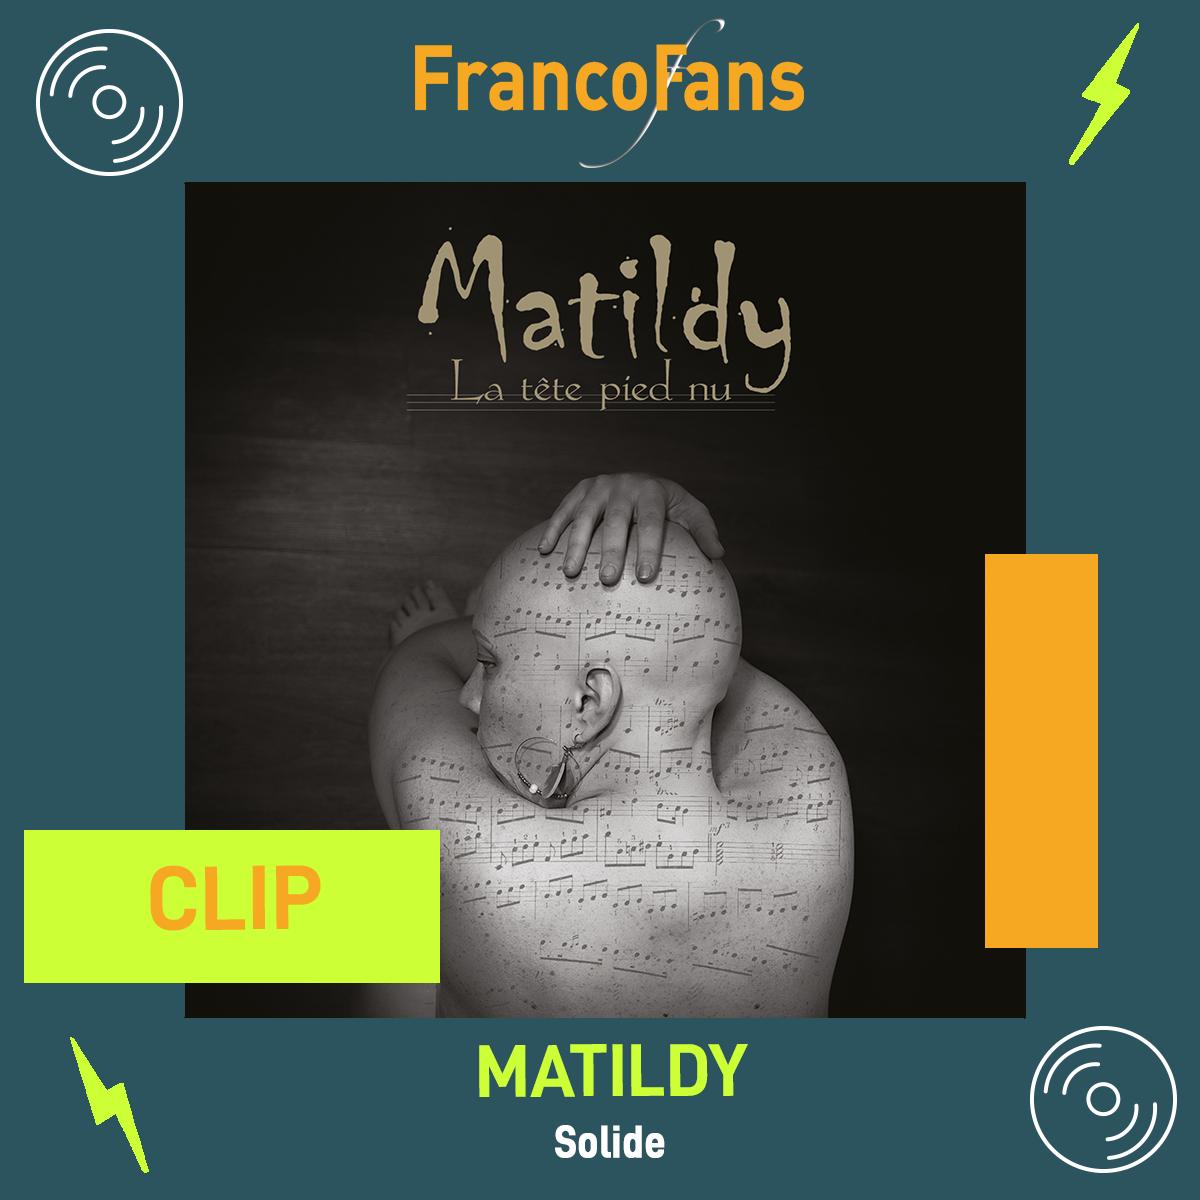 [Clip] Matildy - Solide